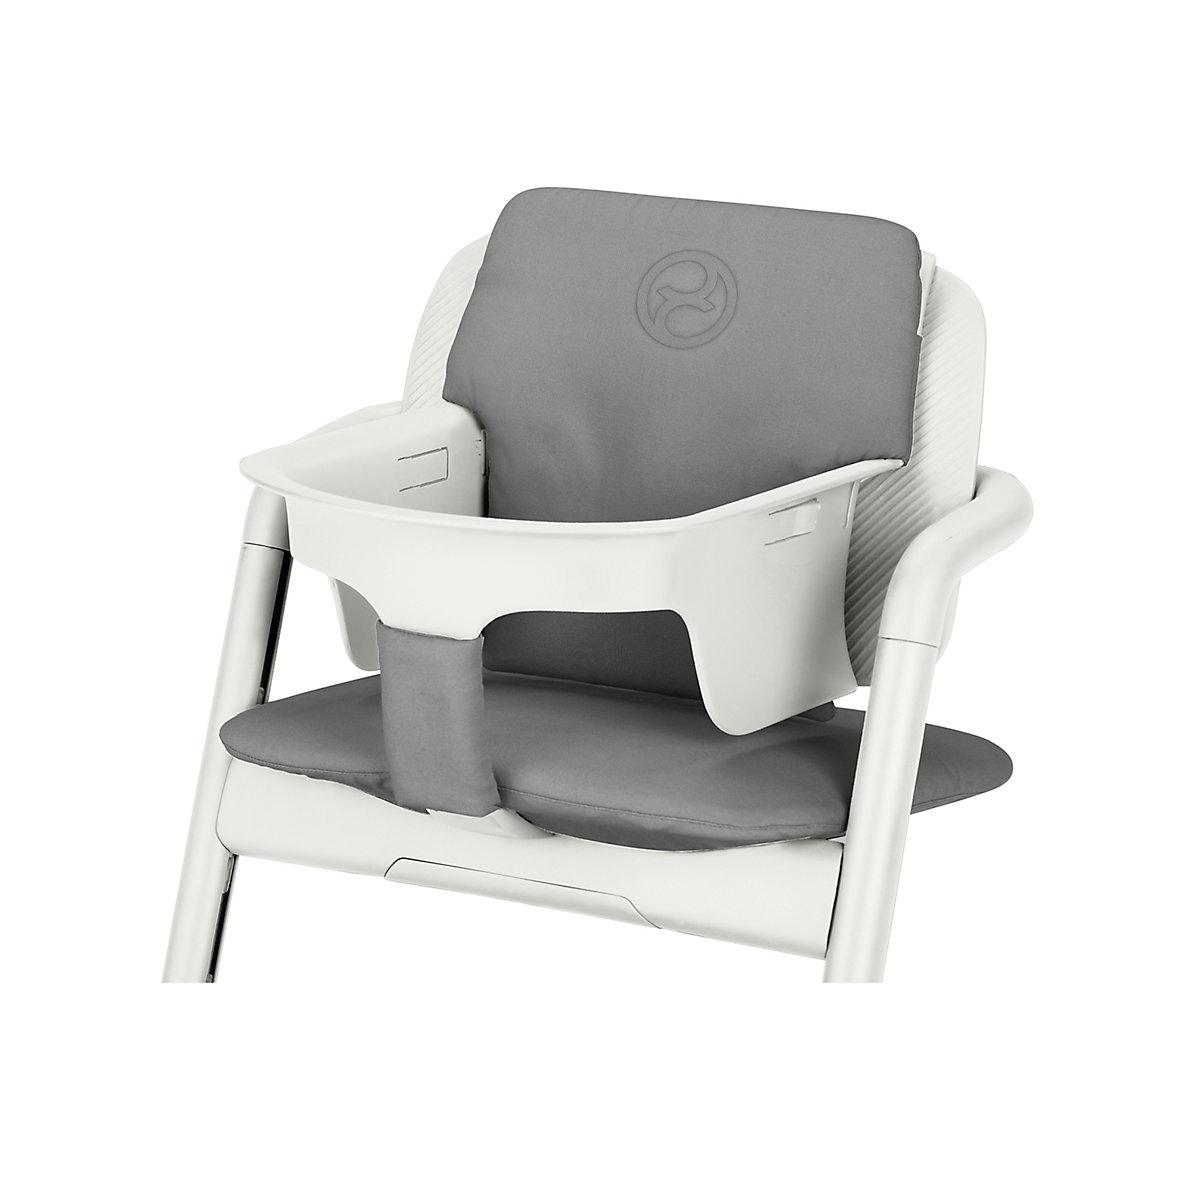 Cybex lemo comfort seat inlay - storm grey